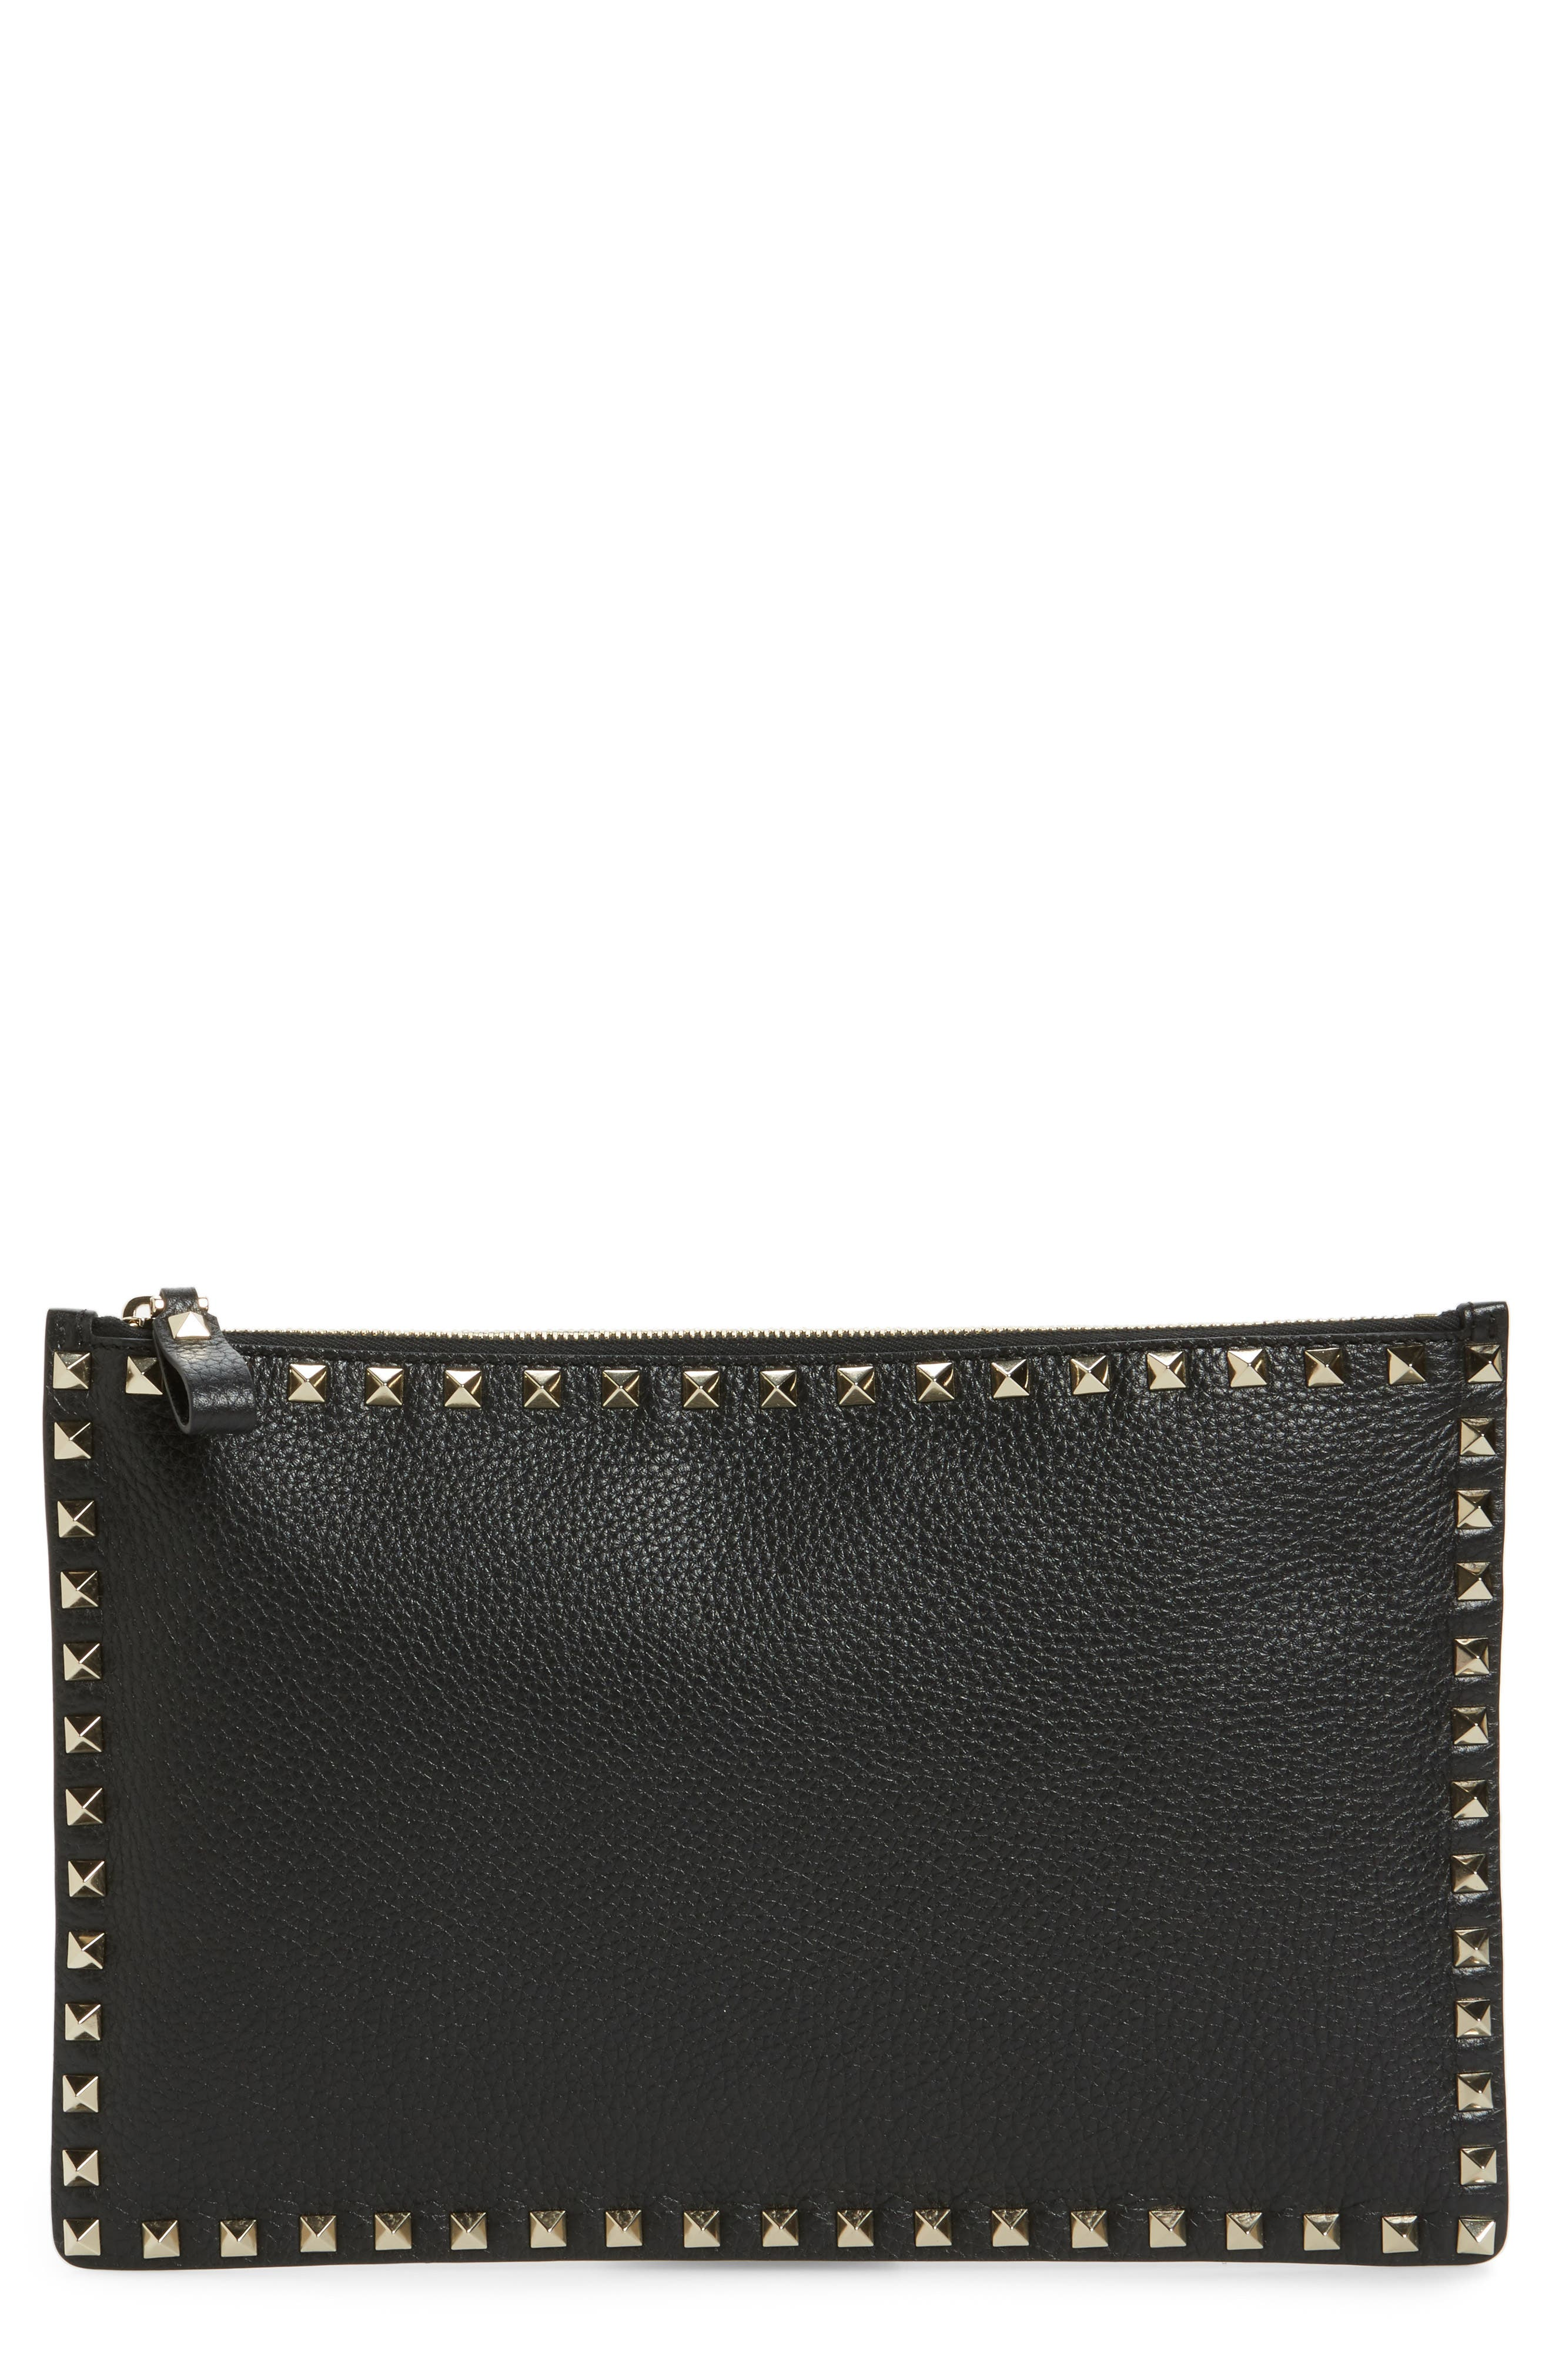 VALENTINO GARAVANI Large Rockstud Flat Leather Zip Pouch